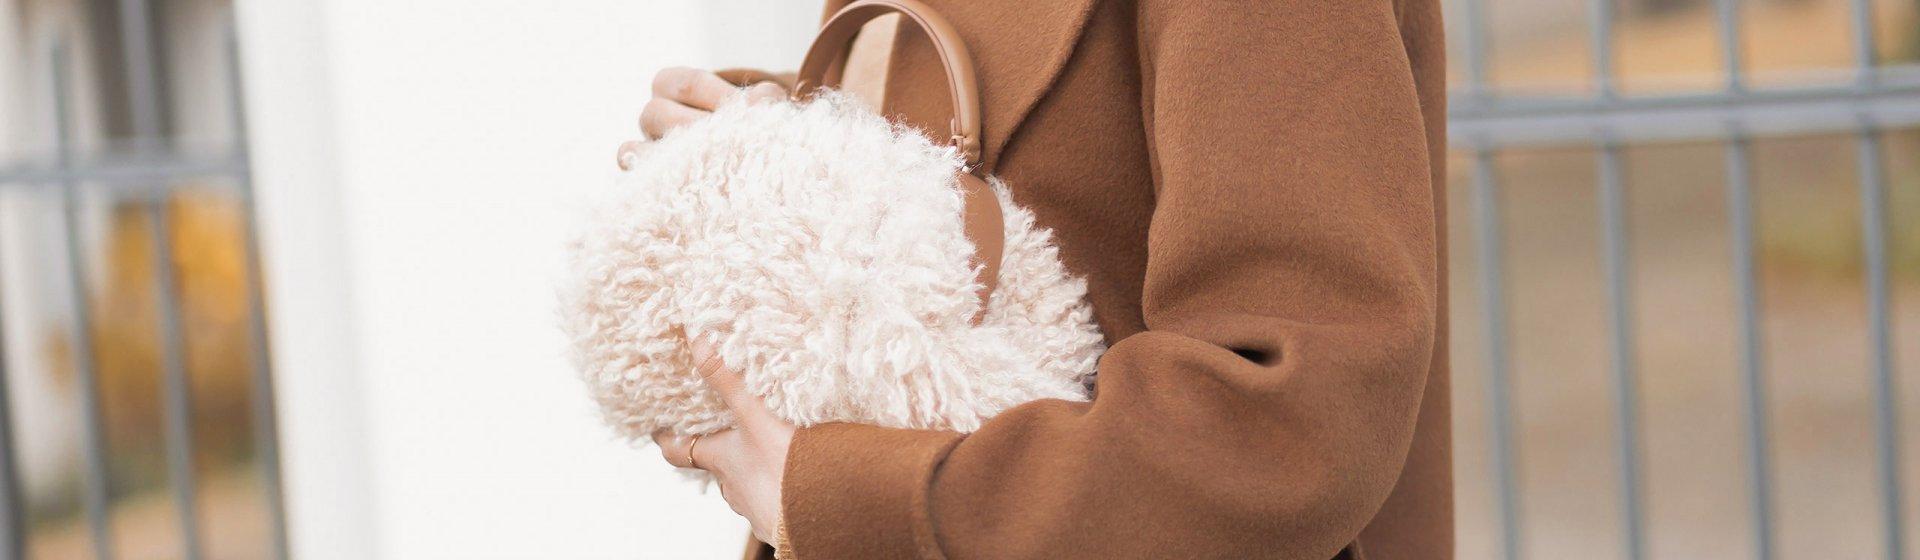 Kunstfelltaschen kombinieren, Fake Fur Bags, Wintertrend, Winteraccessoire, Shoelove by Deichmann